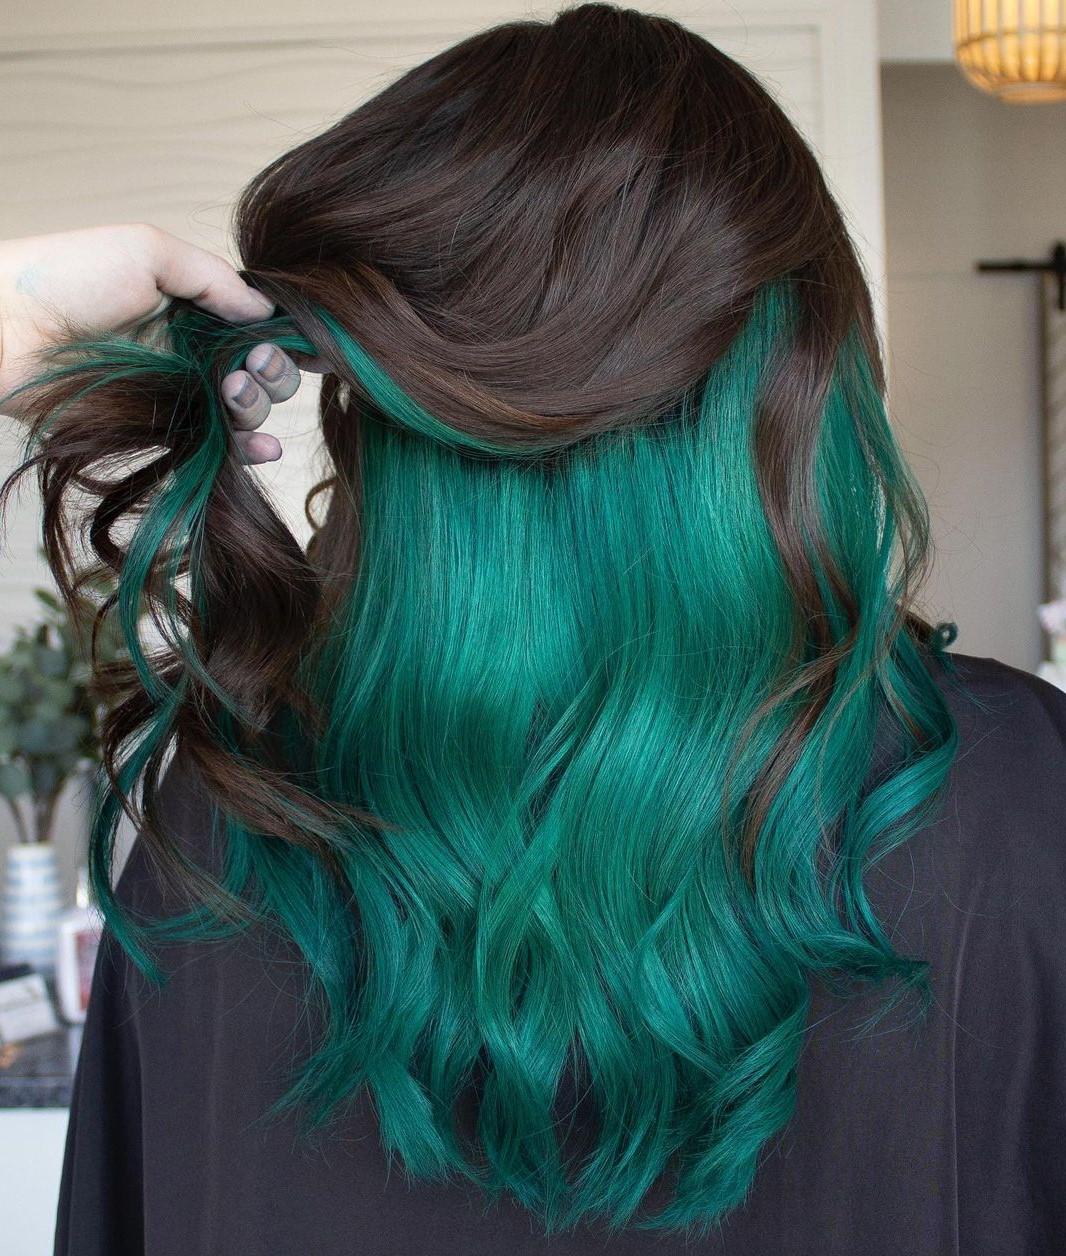 Brunette Hair with Green Peekaboo Layer